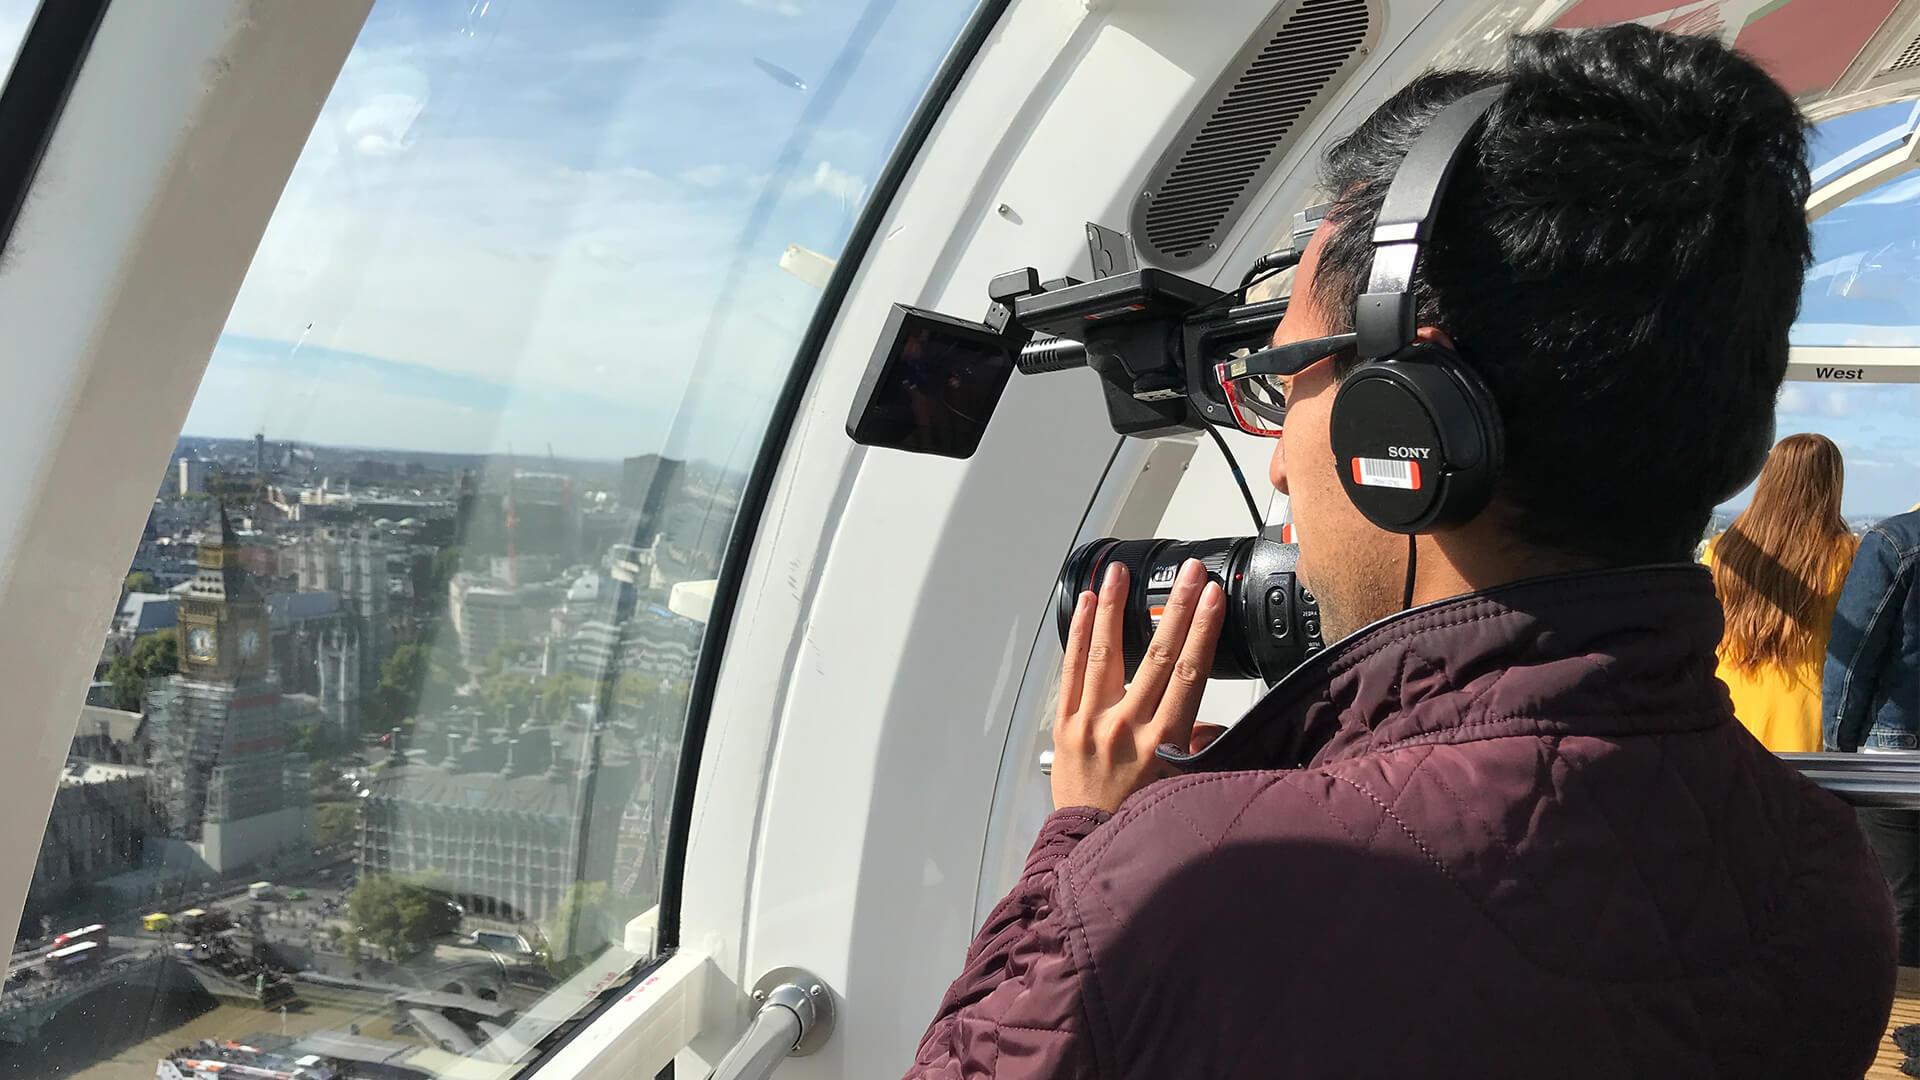 London eye pod filming with camera looking at edinburgh fringe magic show declassified